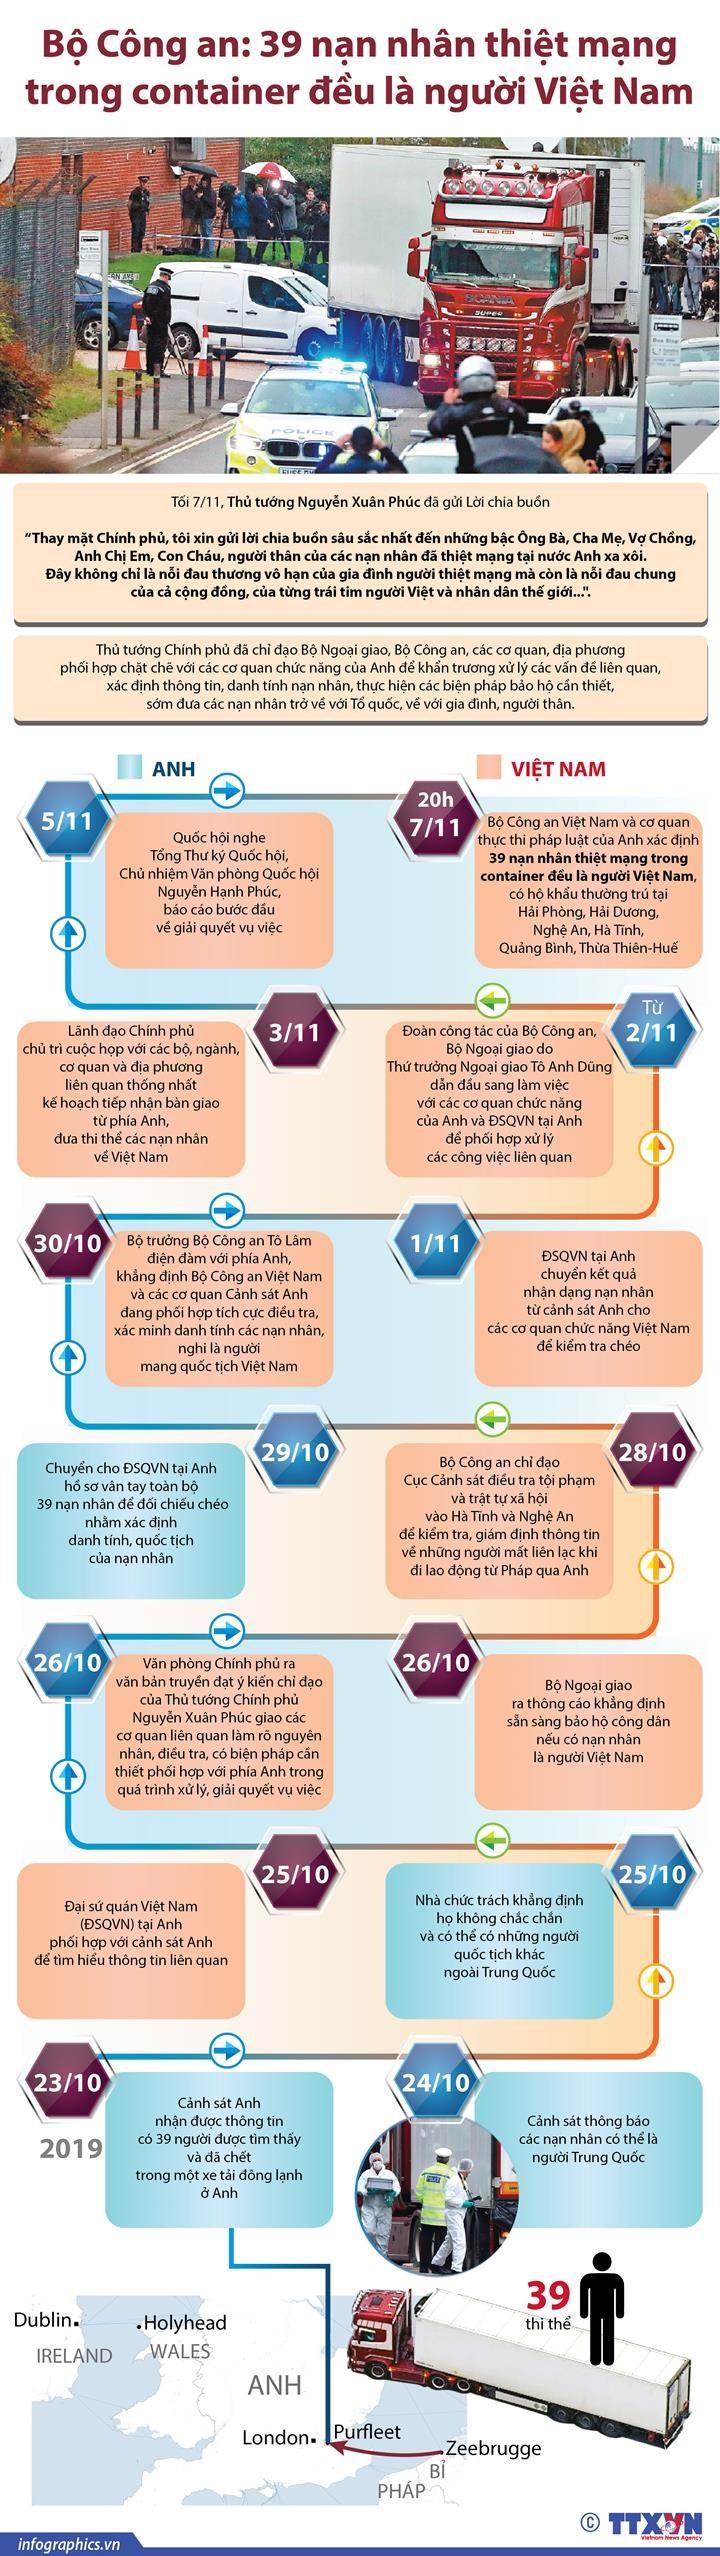 [Infographics] 39 nan nhan chet trong container deu la nguoi Viet hinh anh 1